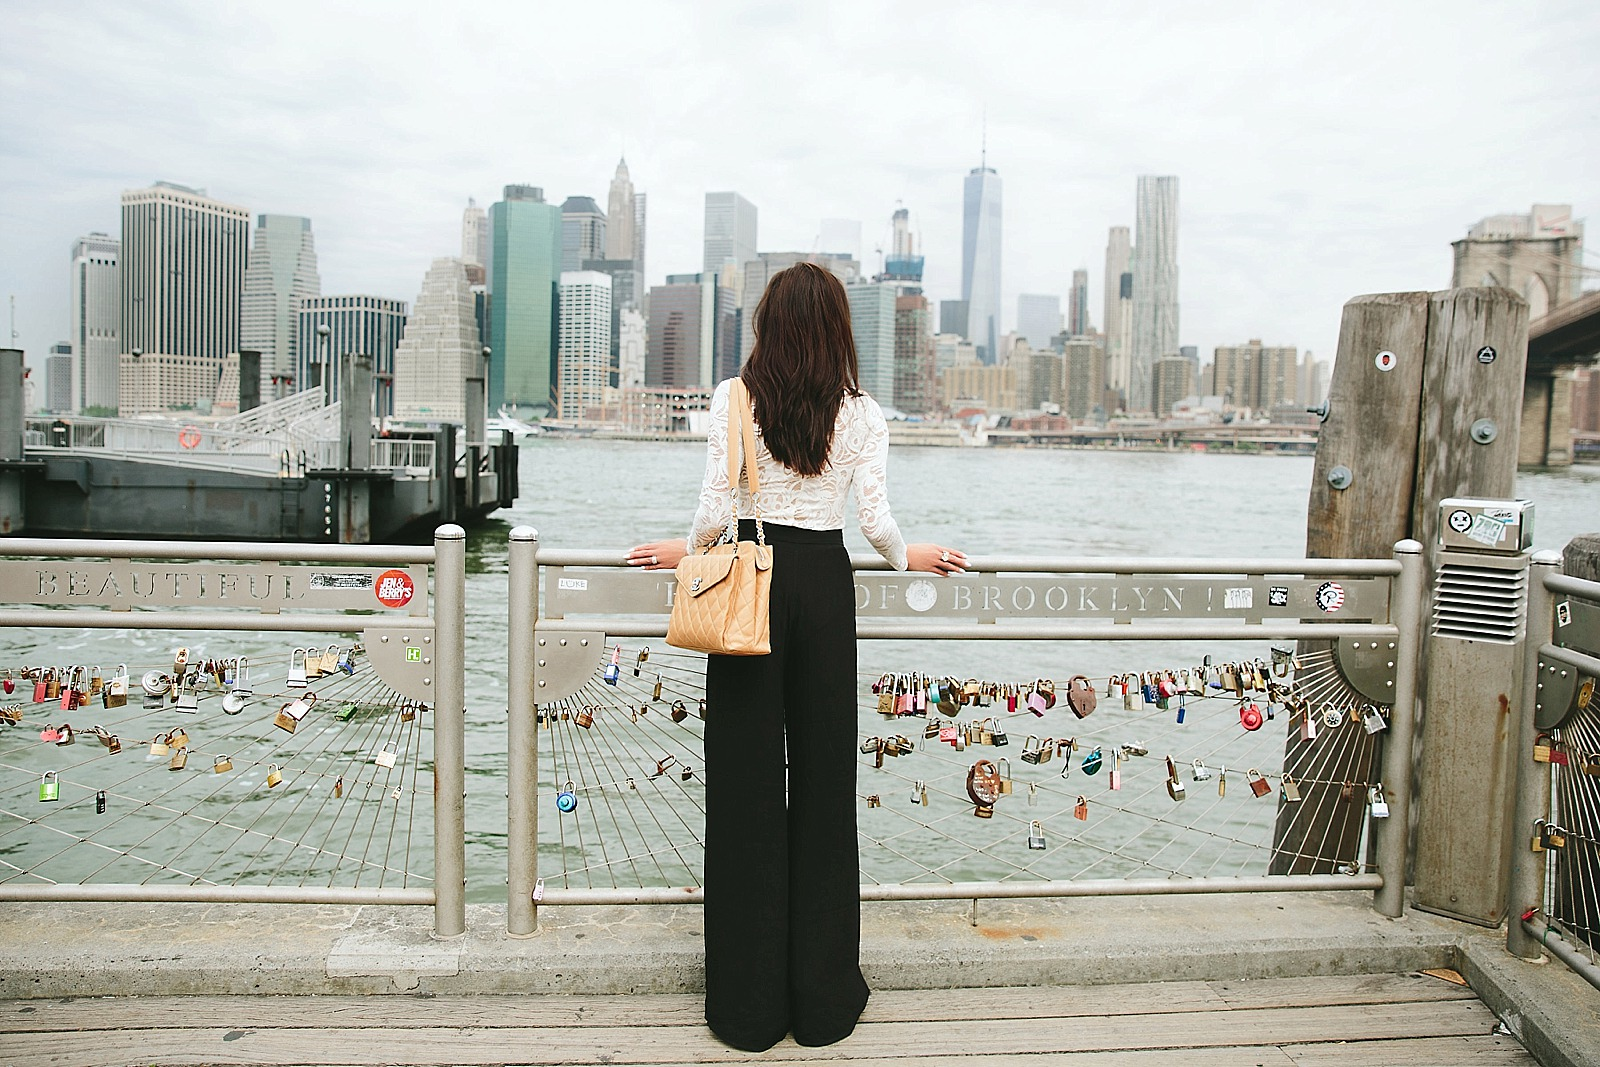 05-23-16_diana_photoshoot_fc-9b